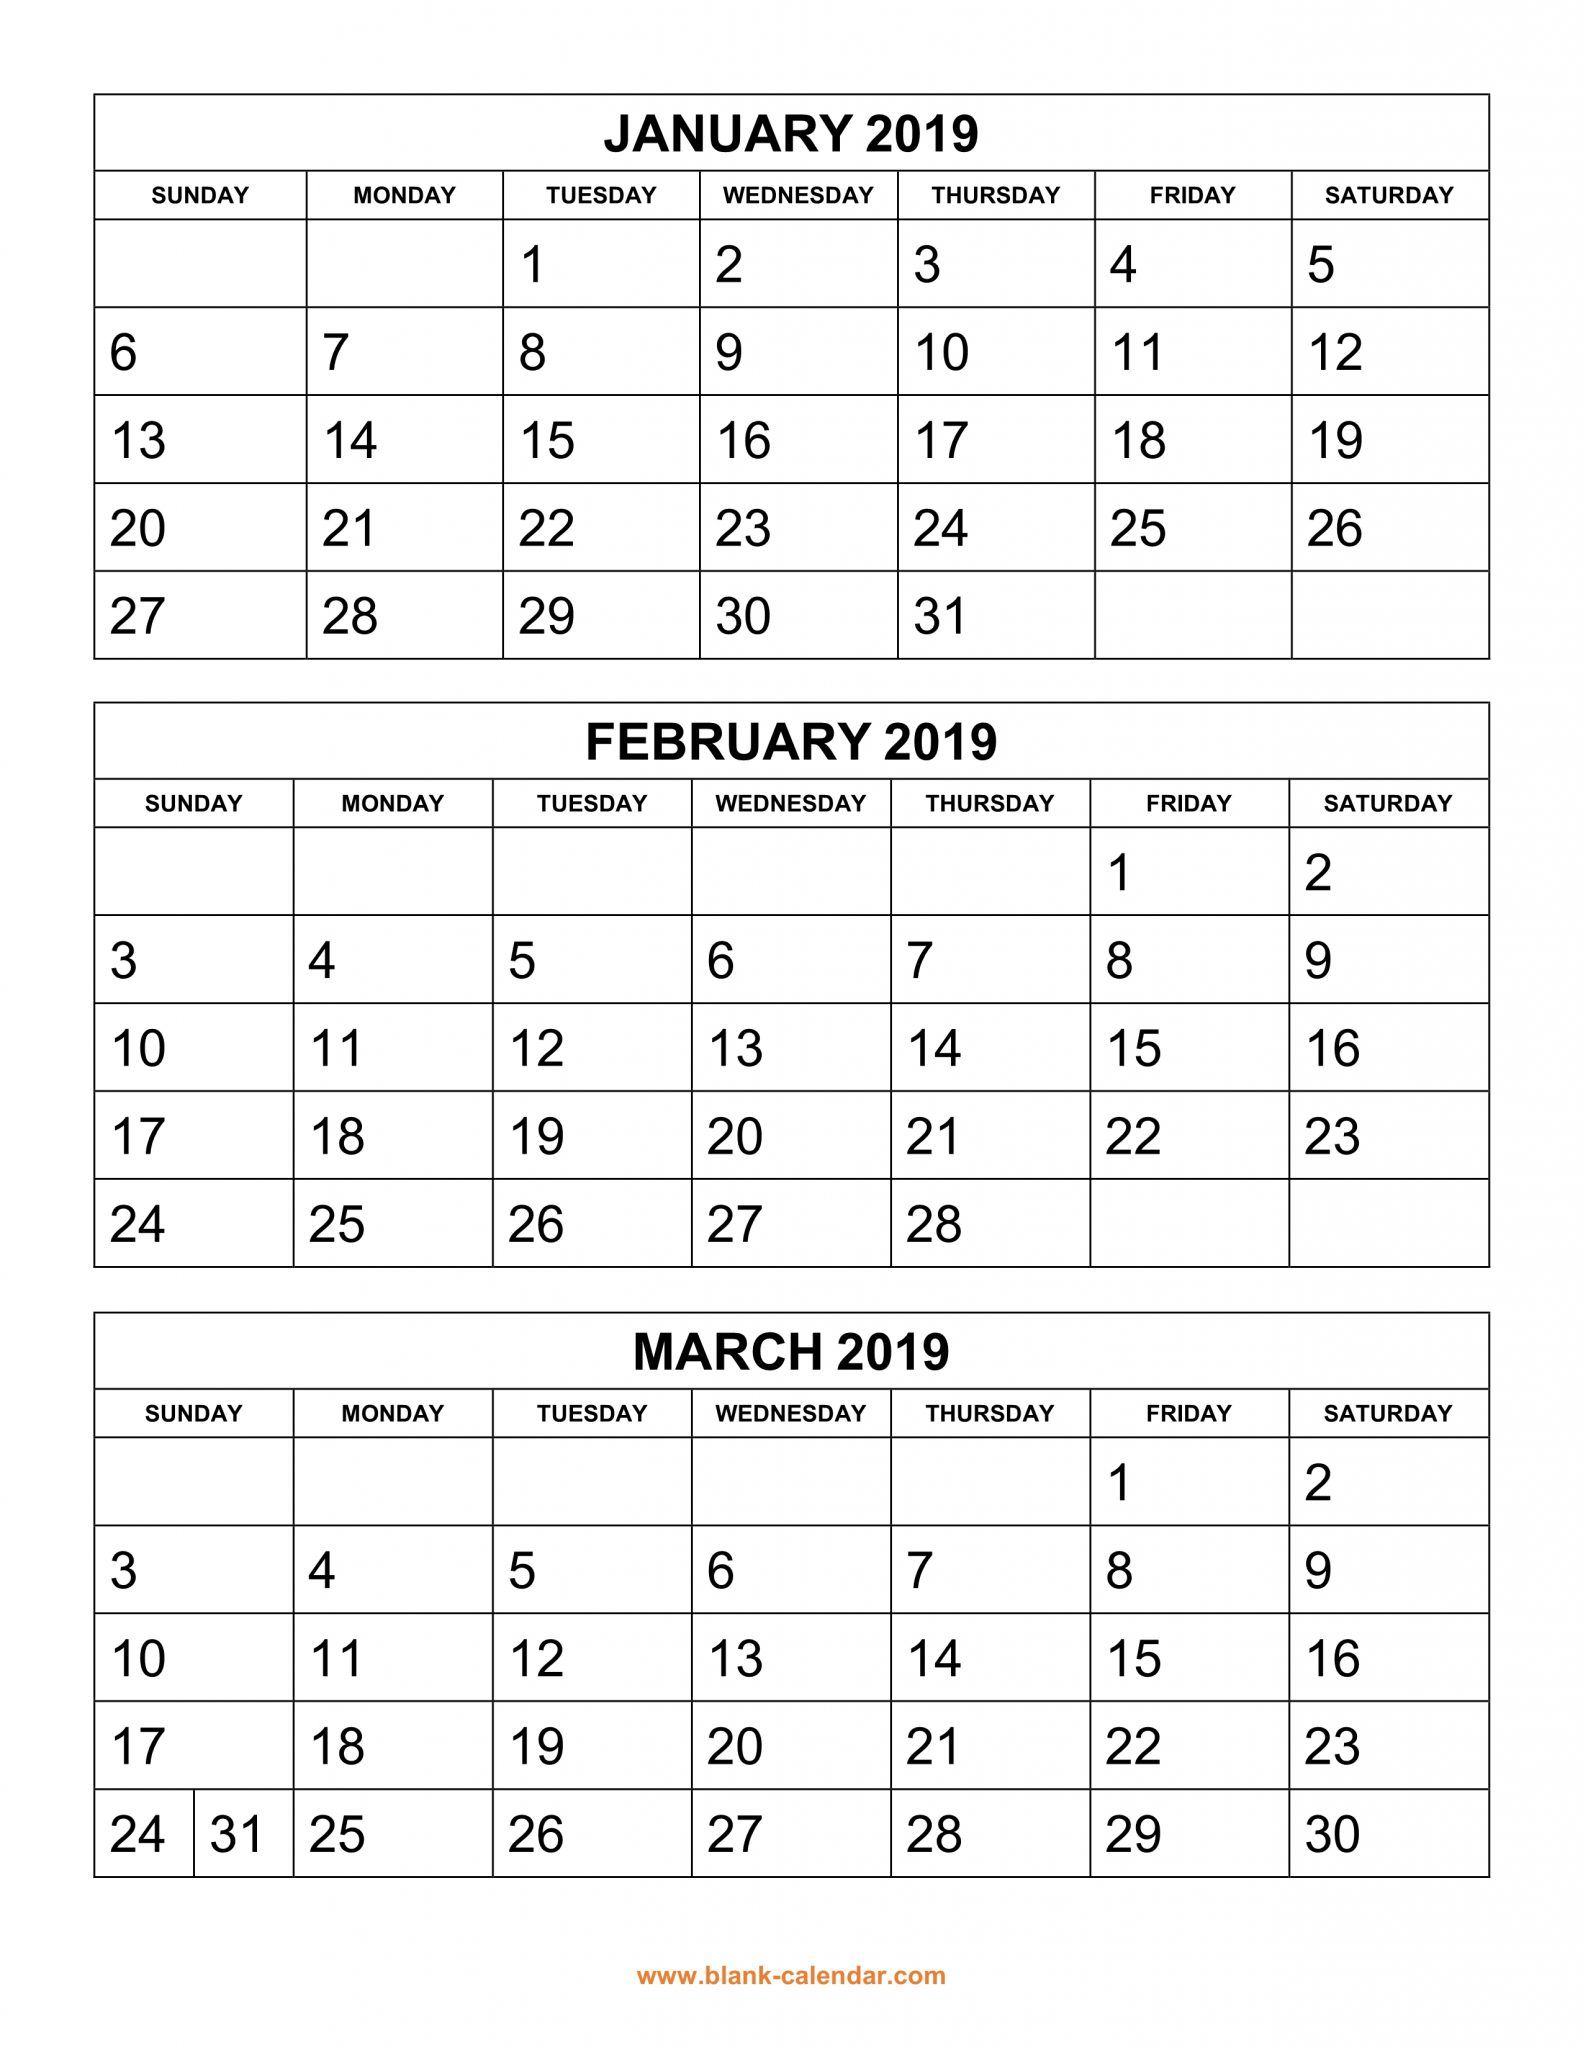 Get Free 2019 3 Month Calendar Templates Printable Download | Top 10 in 3 Month Calendar Templates